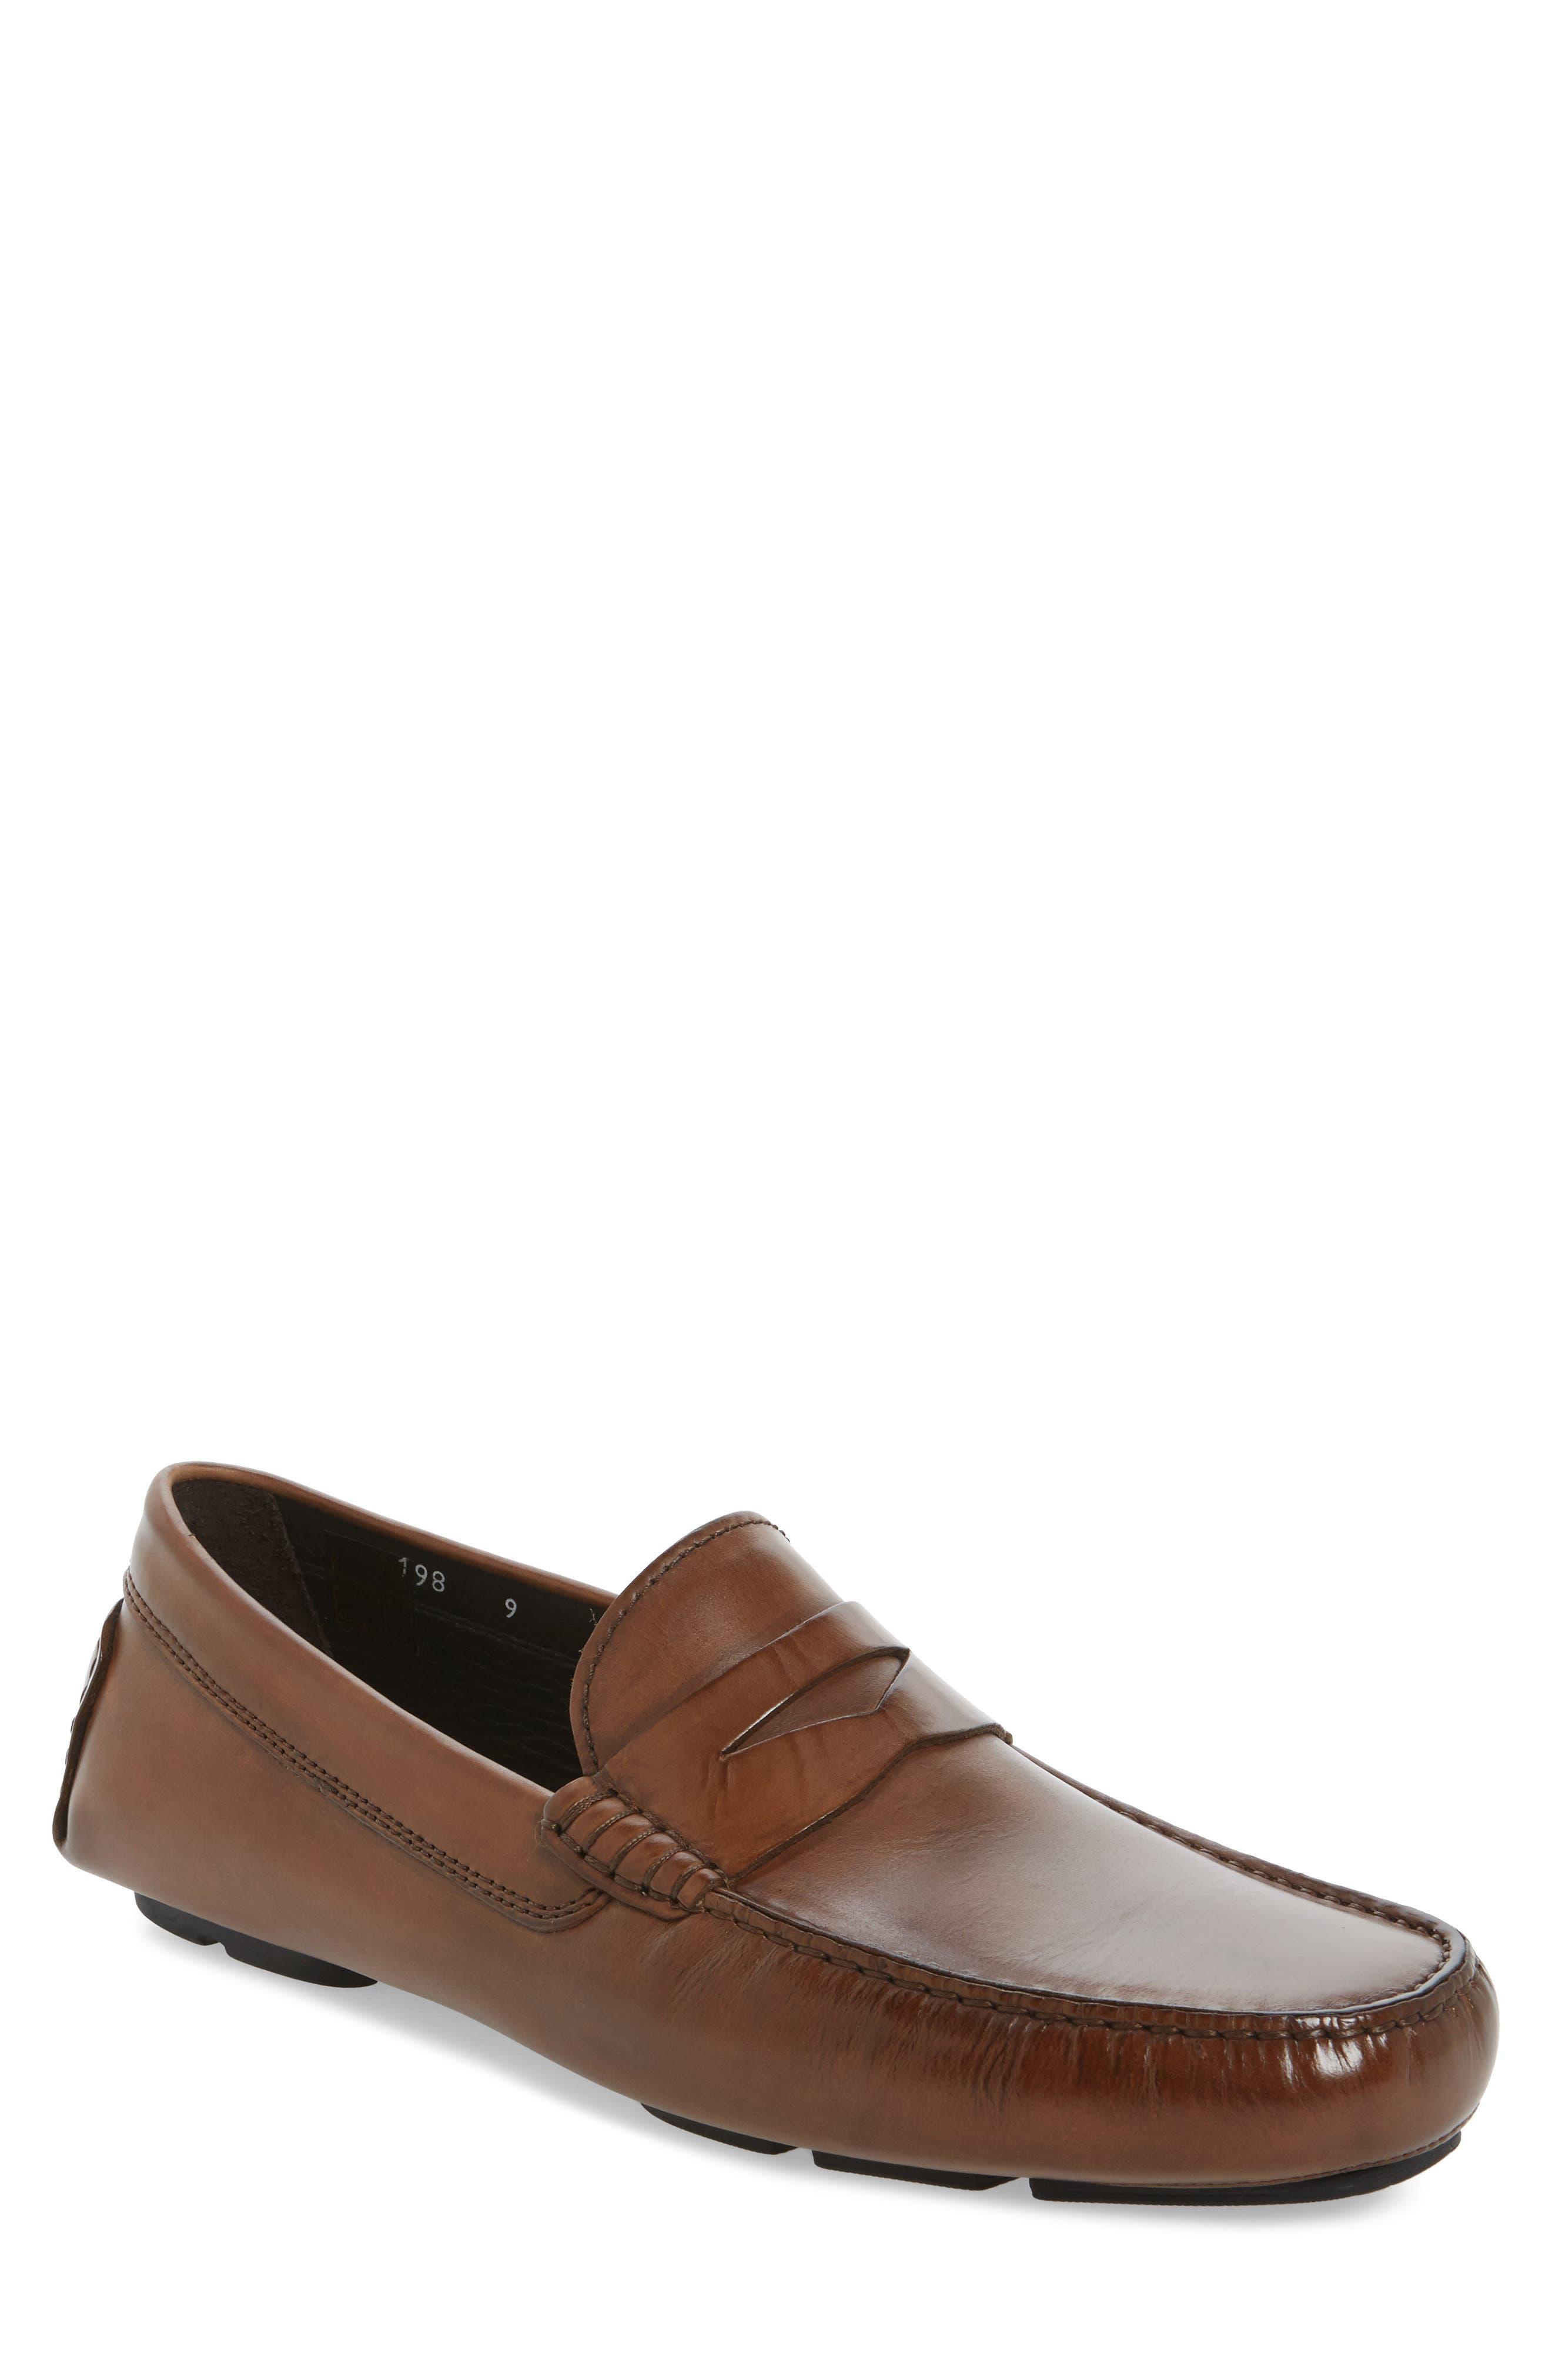 To Boot New York Palo Alto Driving Shoe (Men)